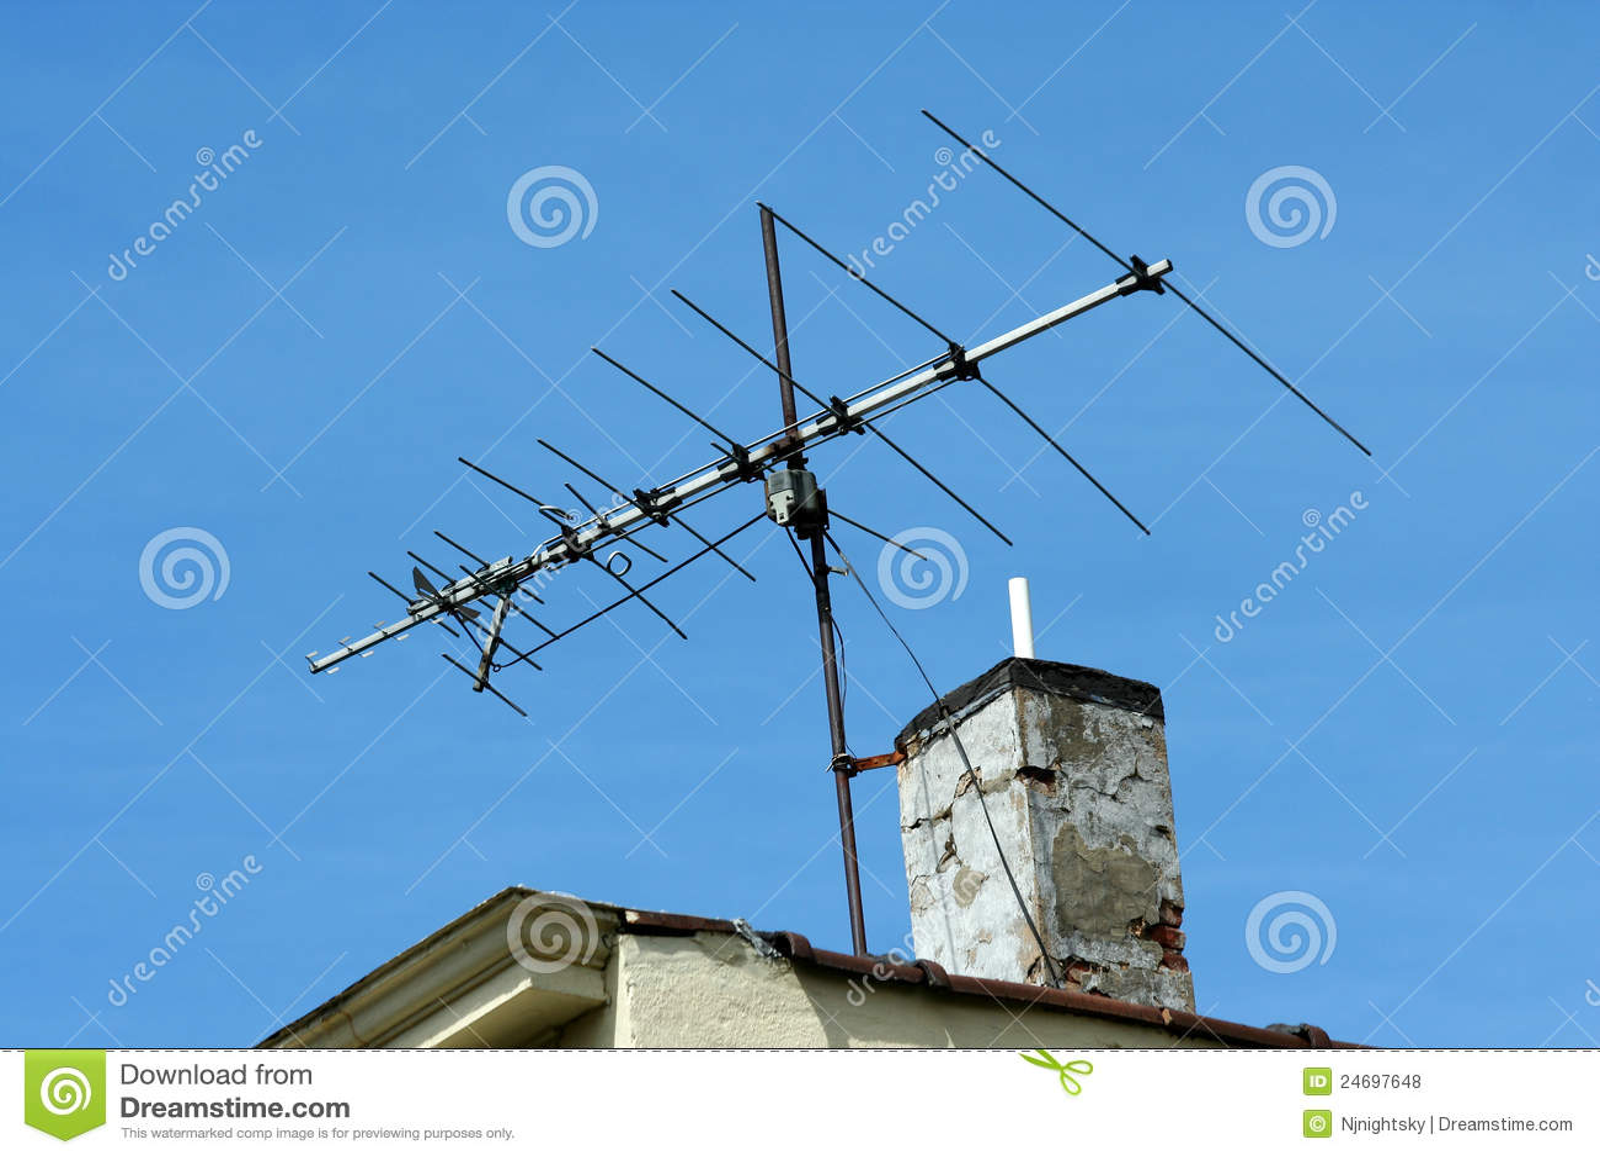 Old Tv Antenna Royalty Free Stock Photos Image 24697648